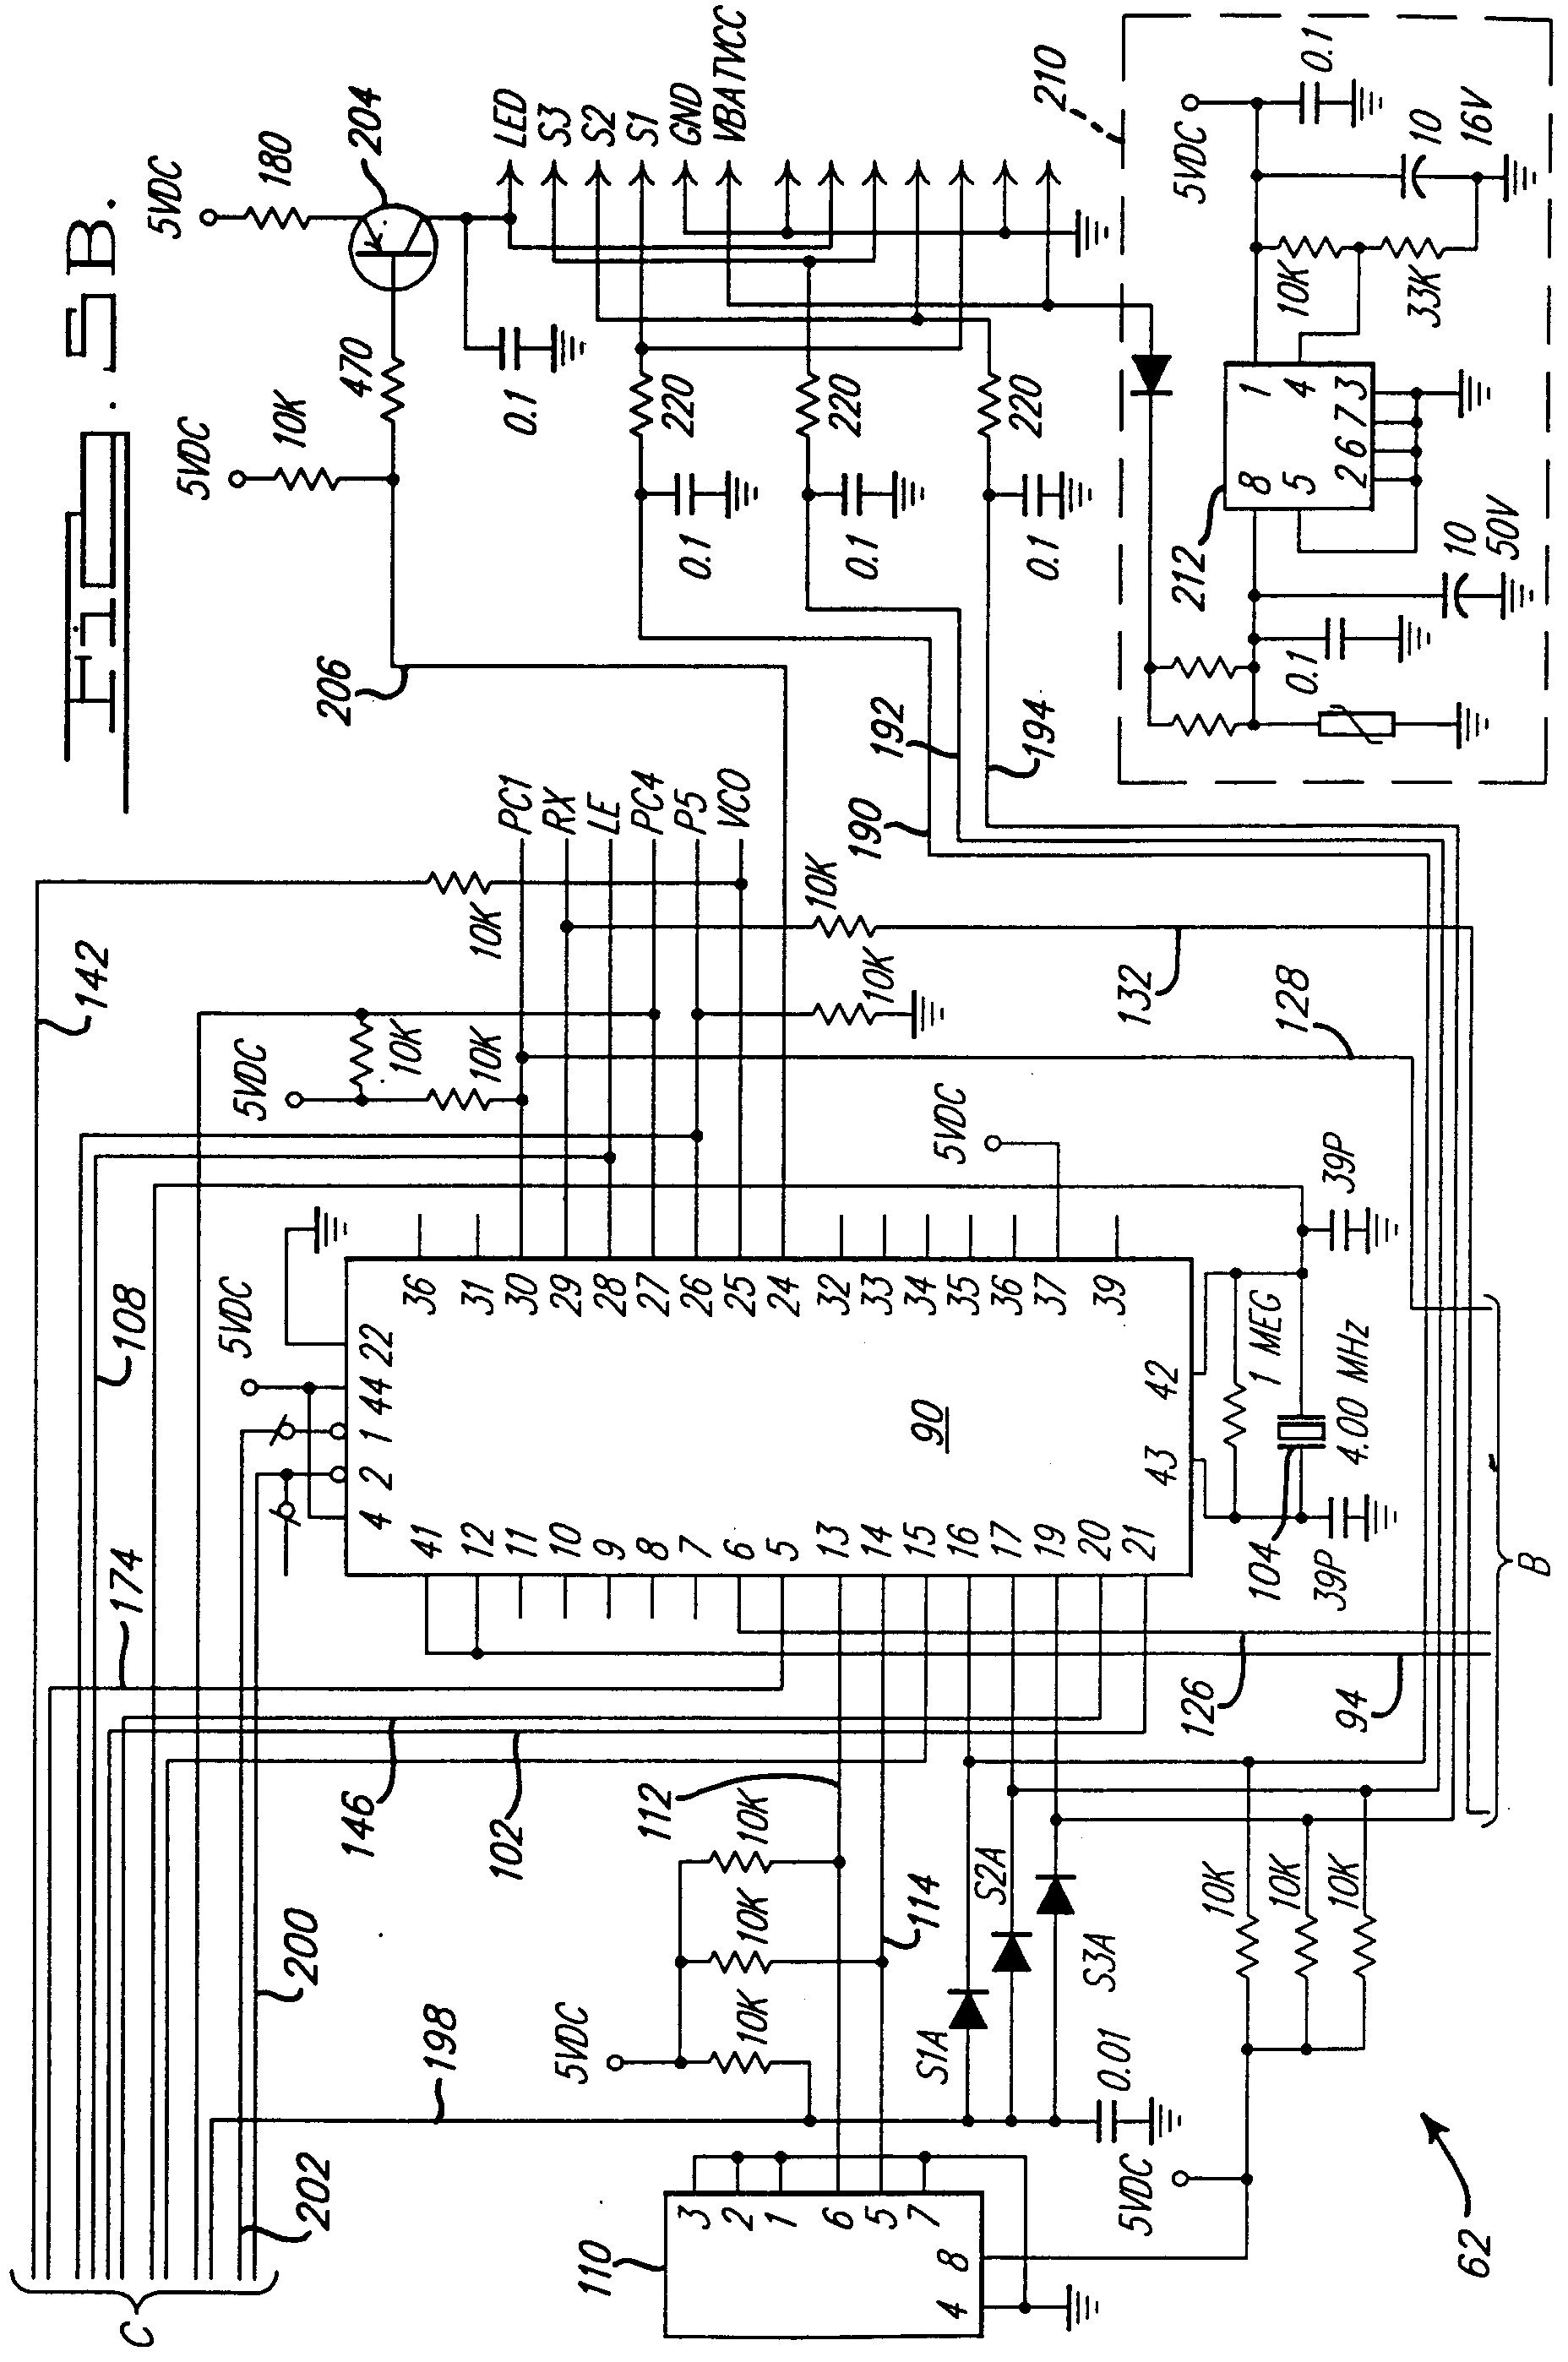 garage door sensor wiring diagram free wiring diagram genie scissor lift wiring diagram genie scissor lift wiring diagram genie scissor lift wiring diagram genie scissor lift wiring diagram